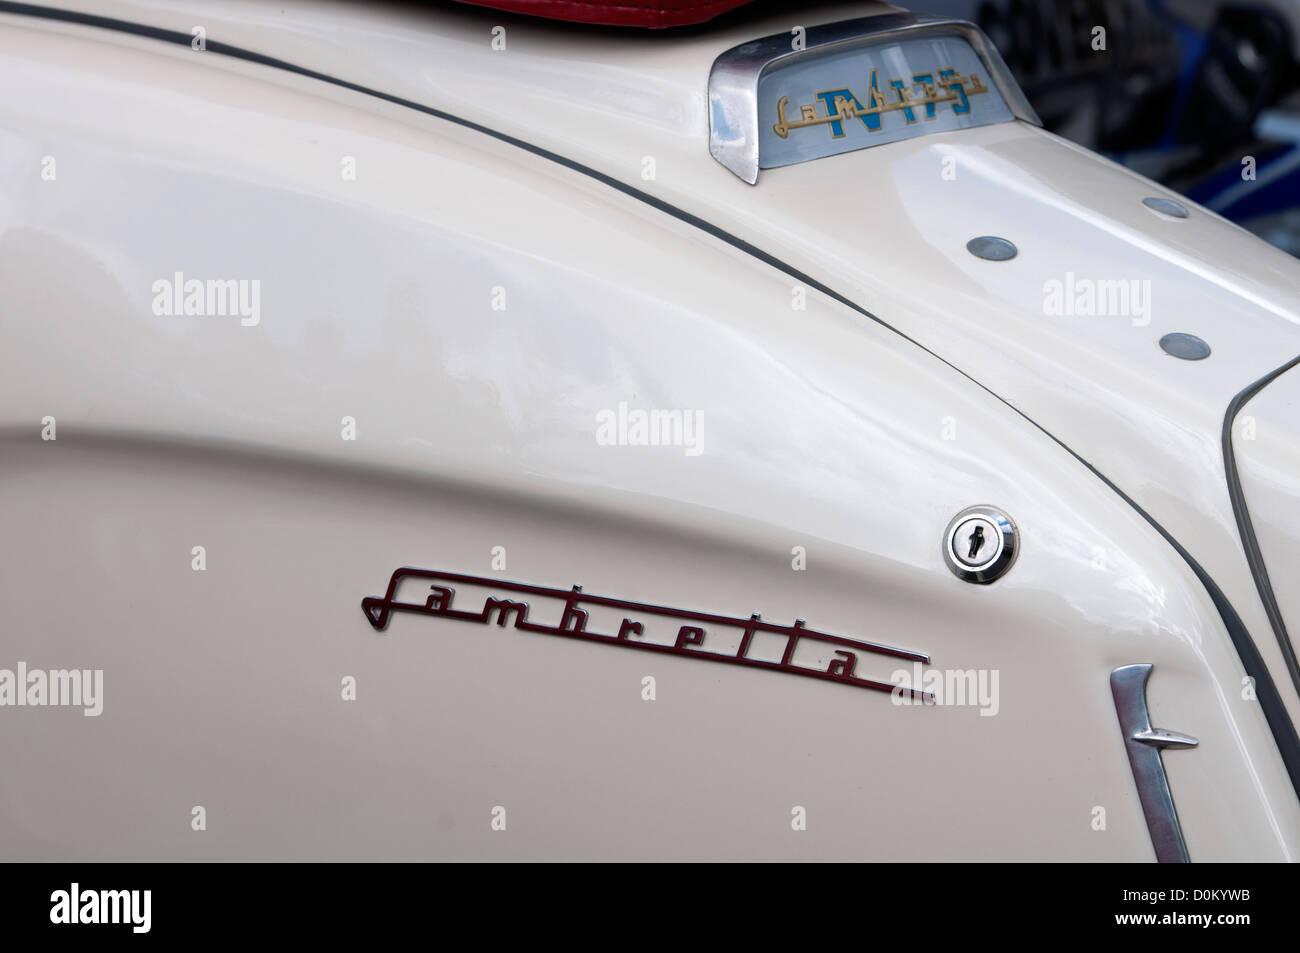 Lambretta TV 175 motor scooter - Stock Image